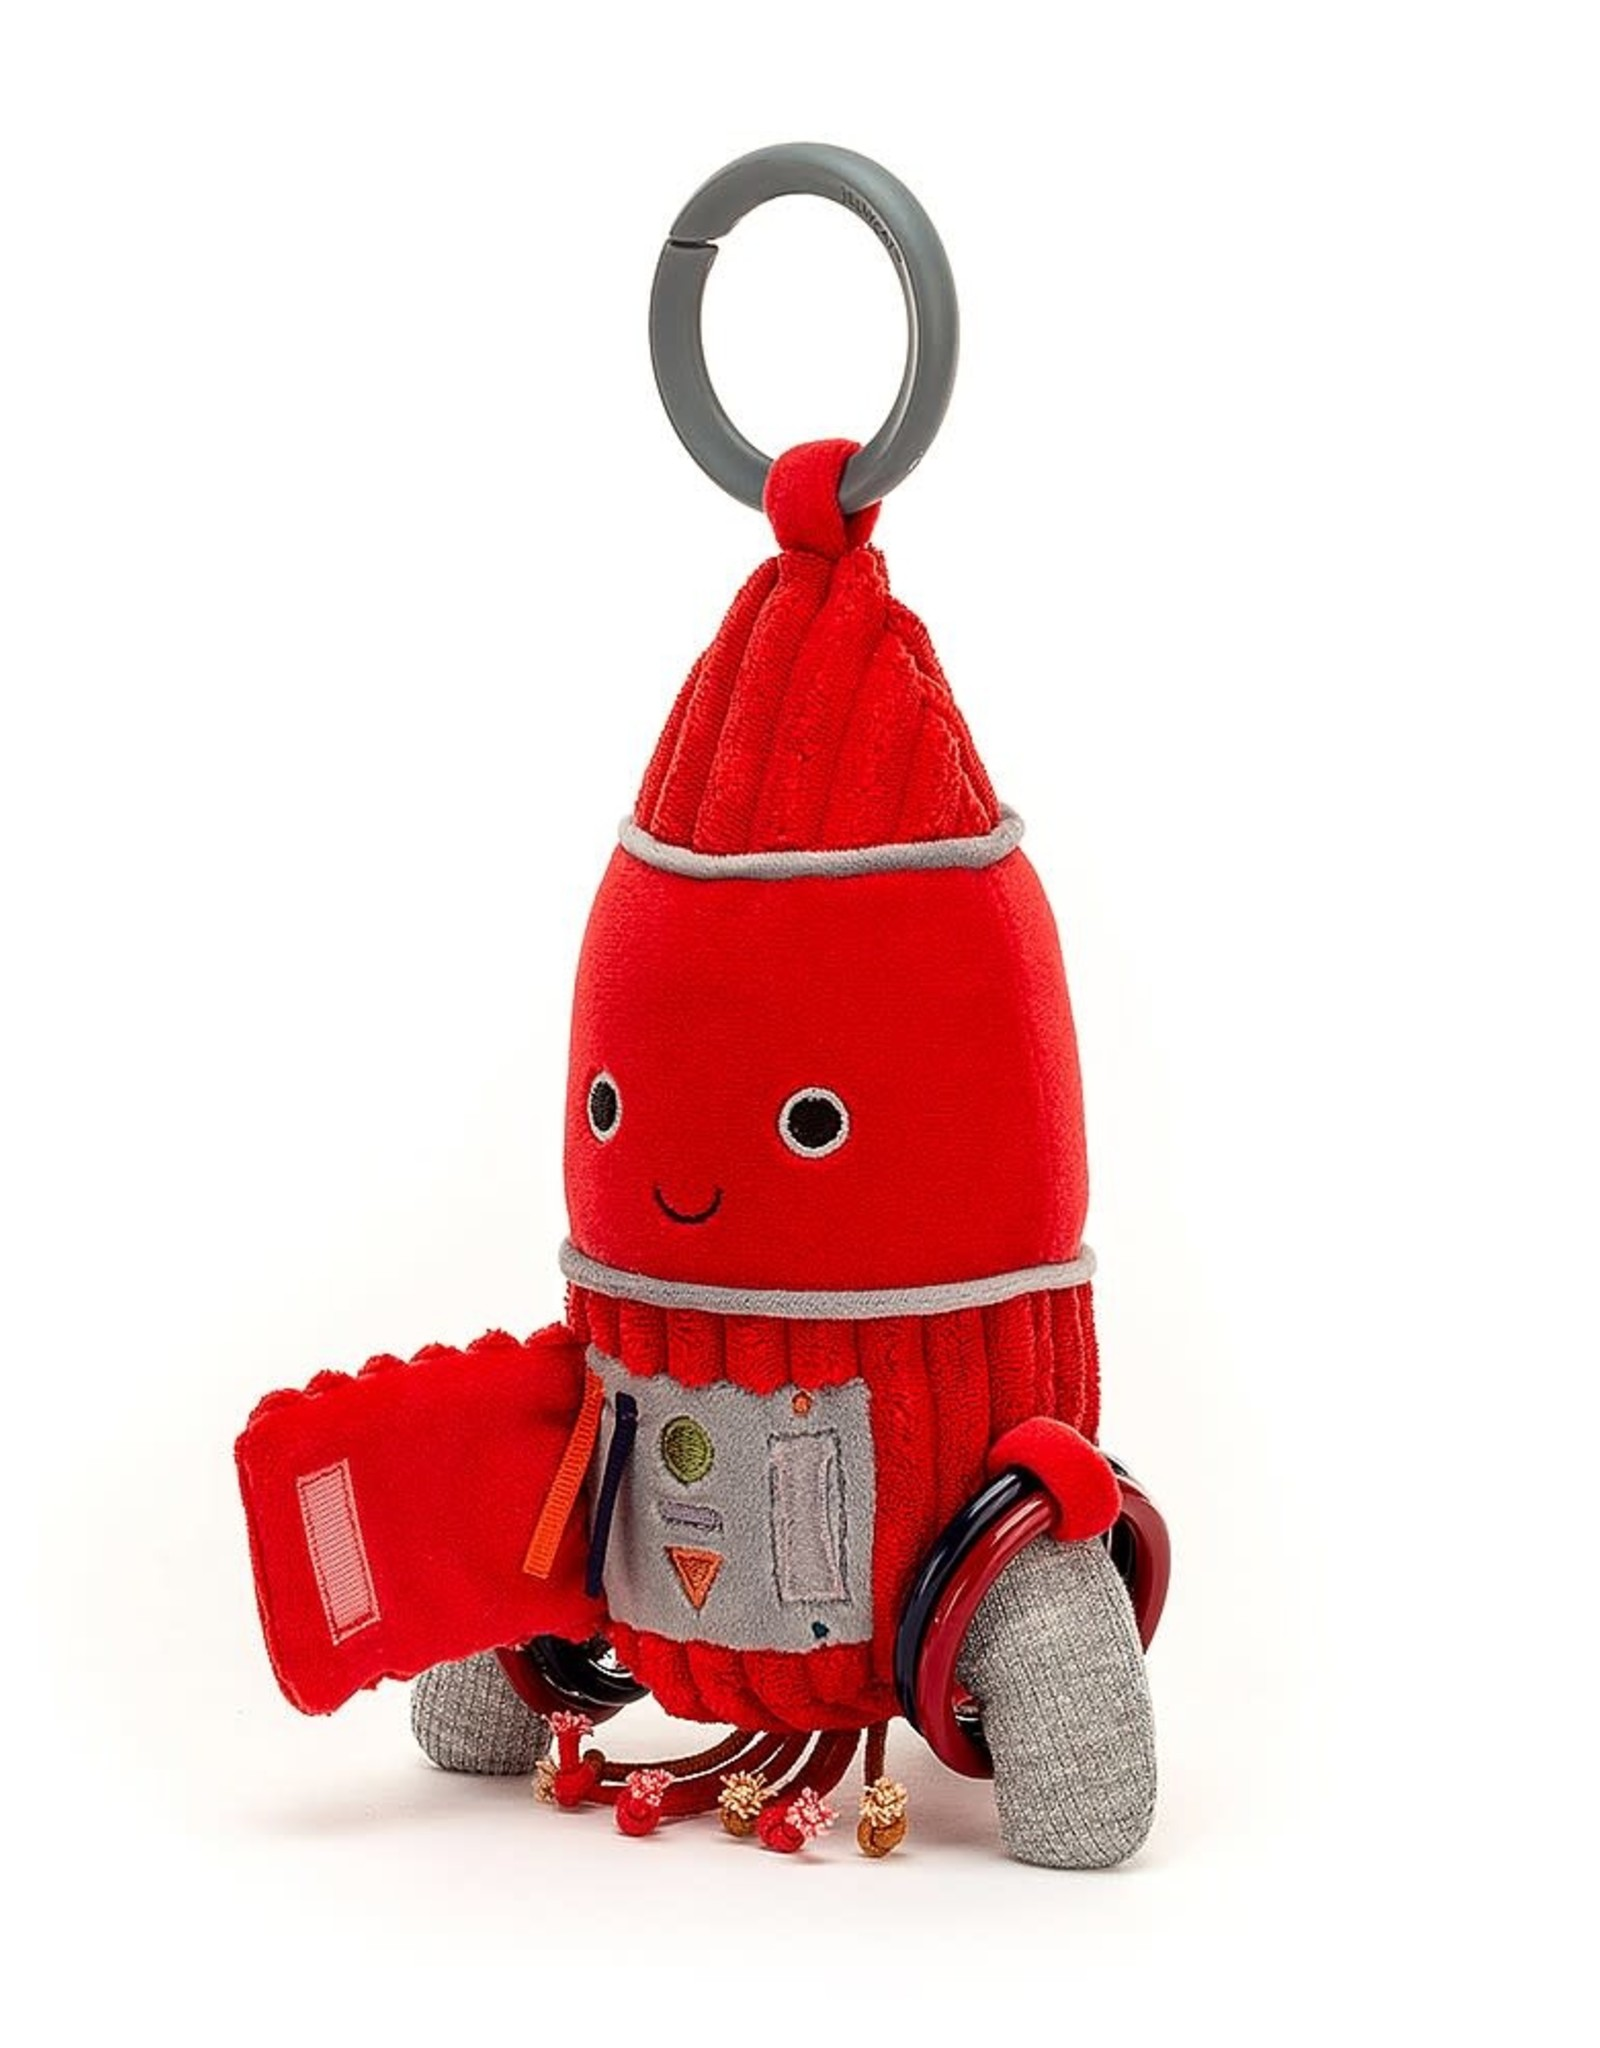 Jellycat Cosmopop Activity Toy